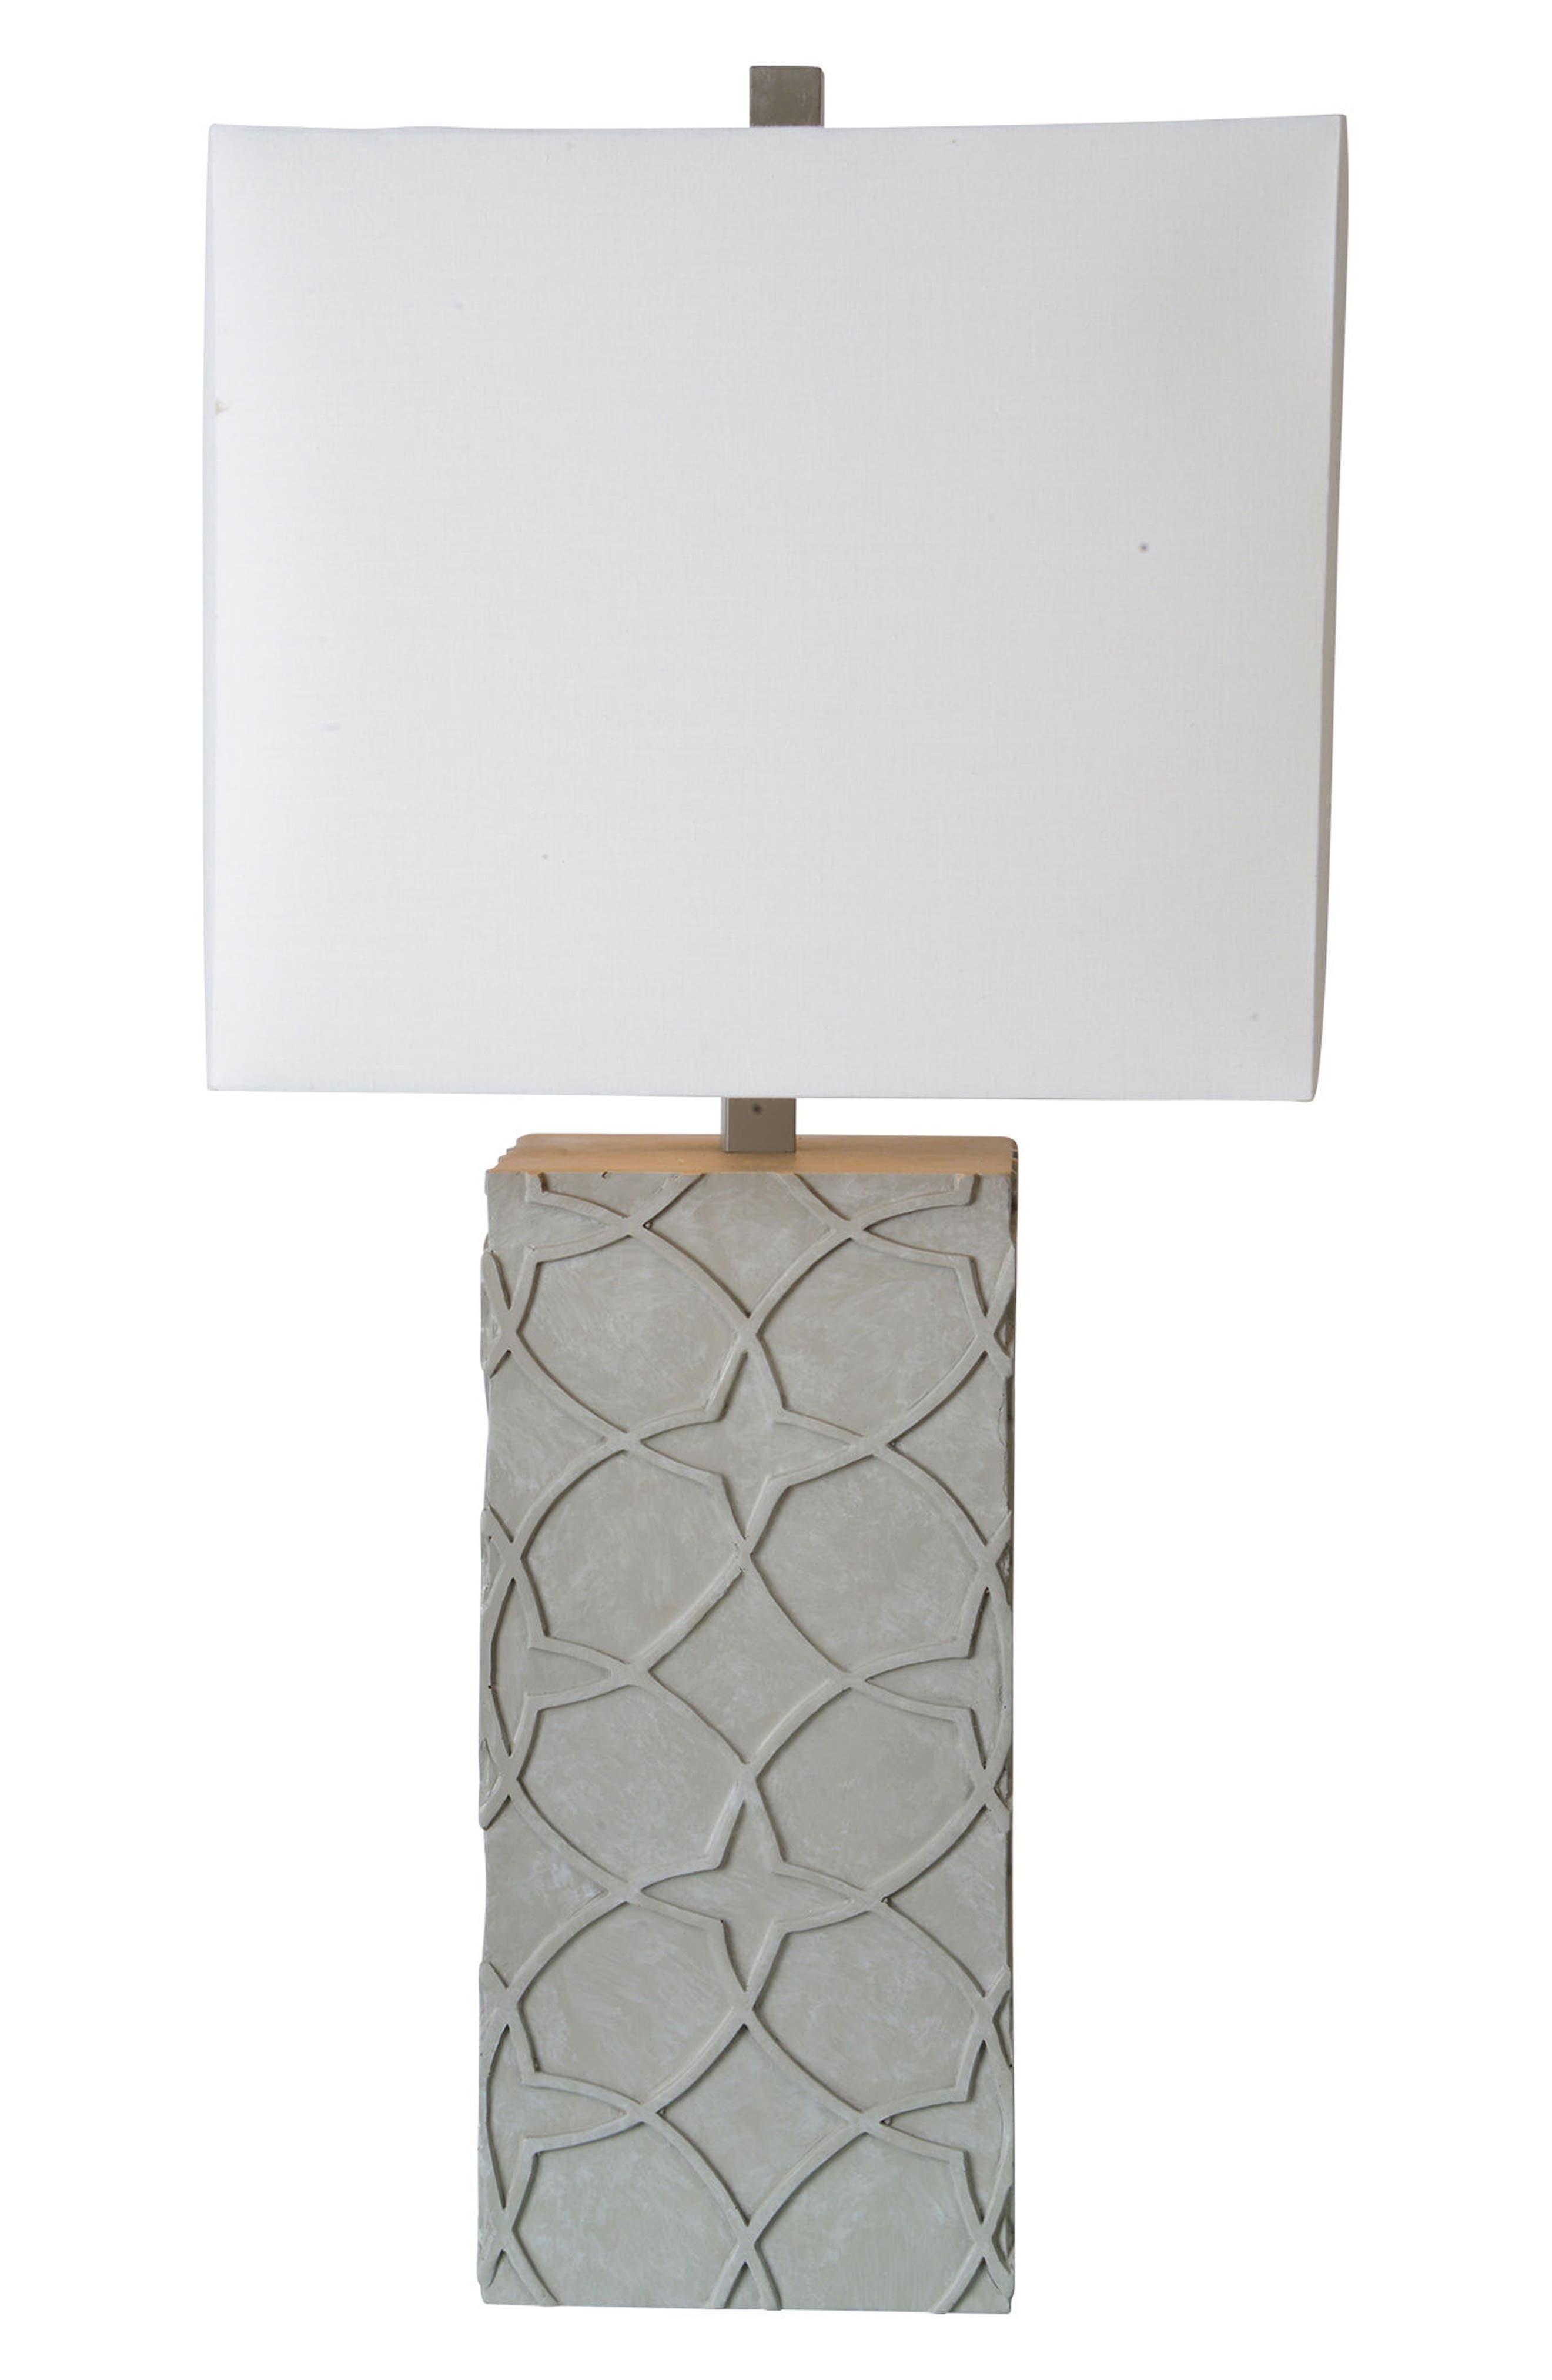 Barkly Table Lamp,                             Main thumbnail 1, color,                             CONCRETE